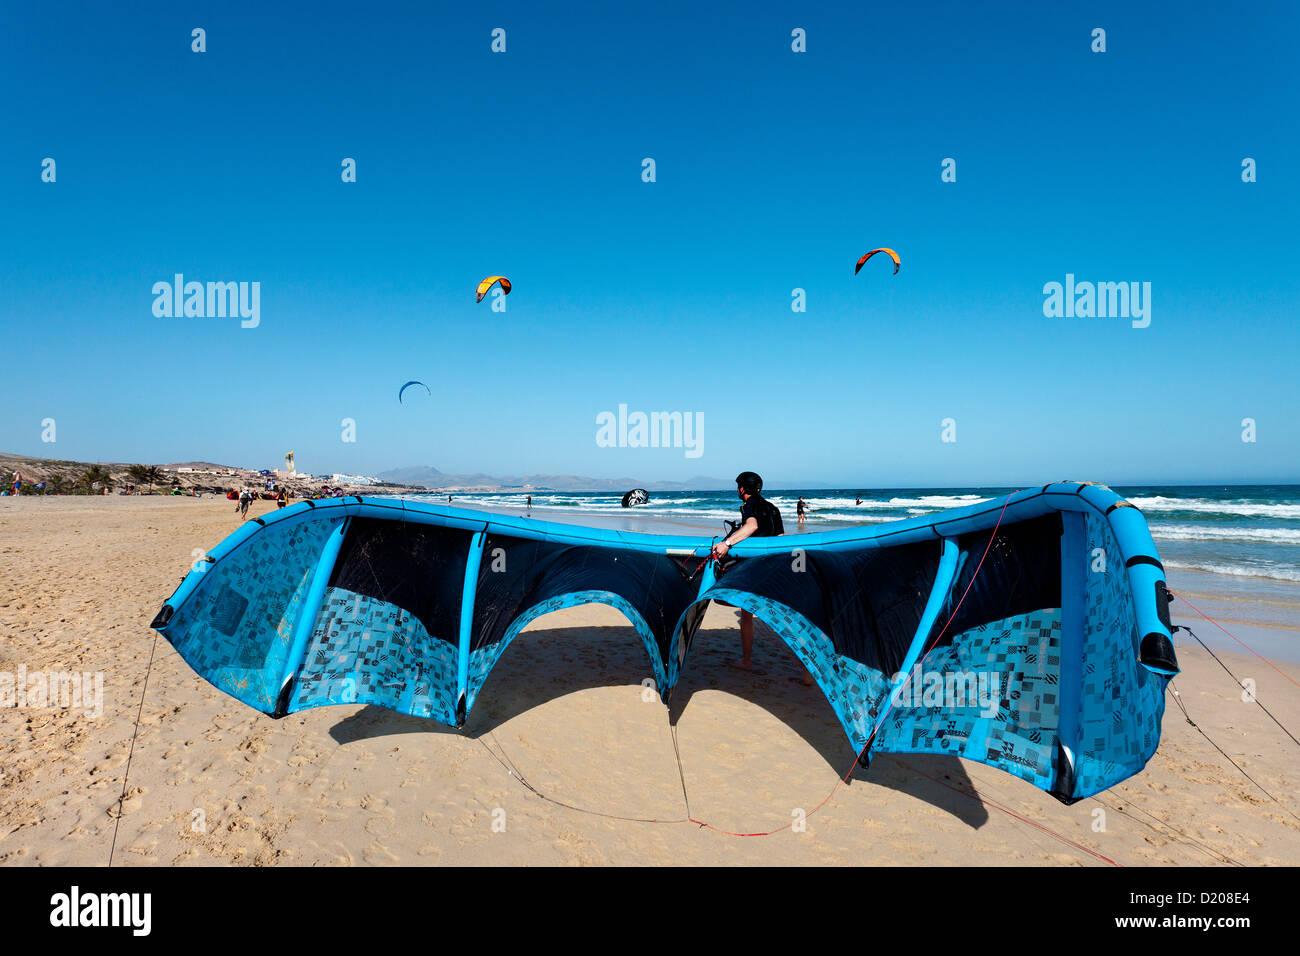 Kite surfer at beach, Playa Barca, Playa de Sotavento, Fuerteventura, Canary Islands, Spain - Stock Image